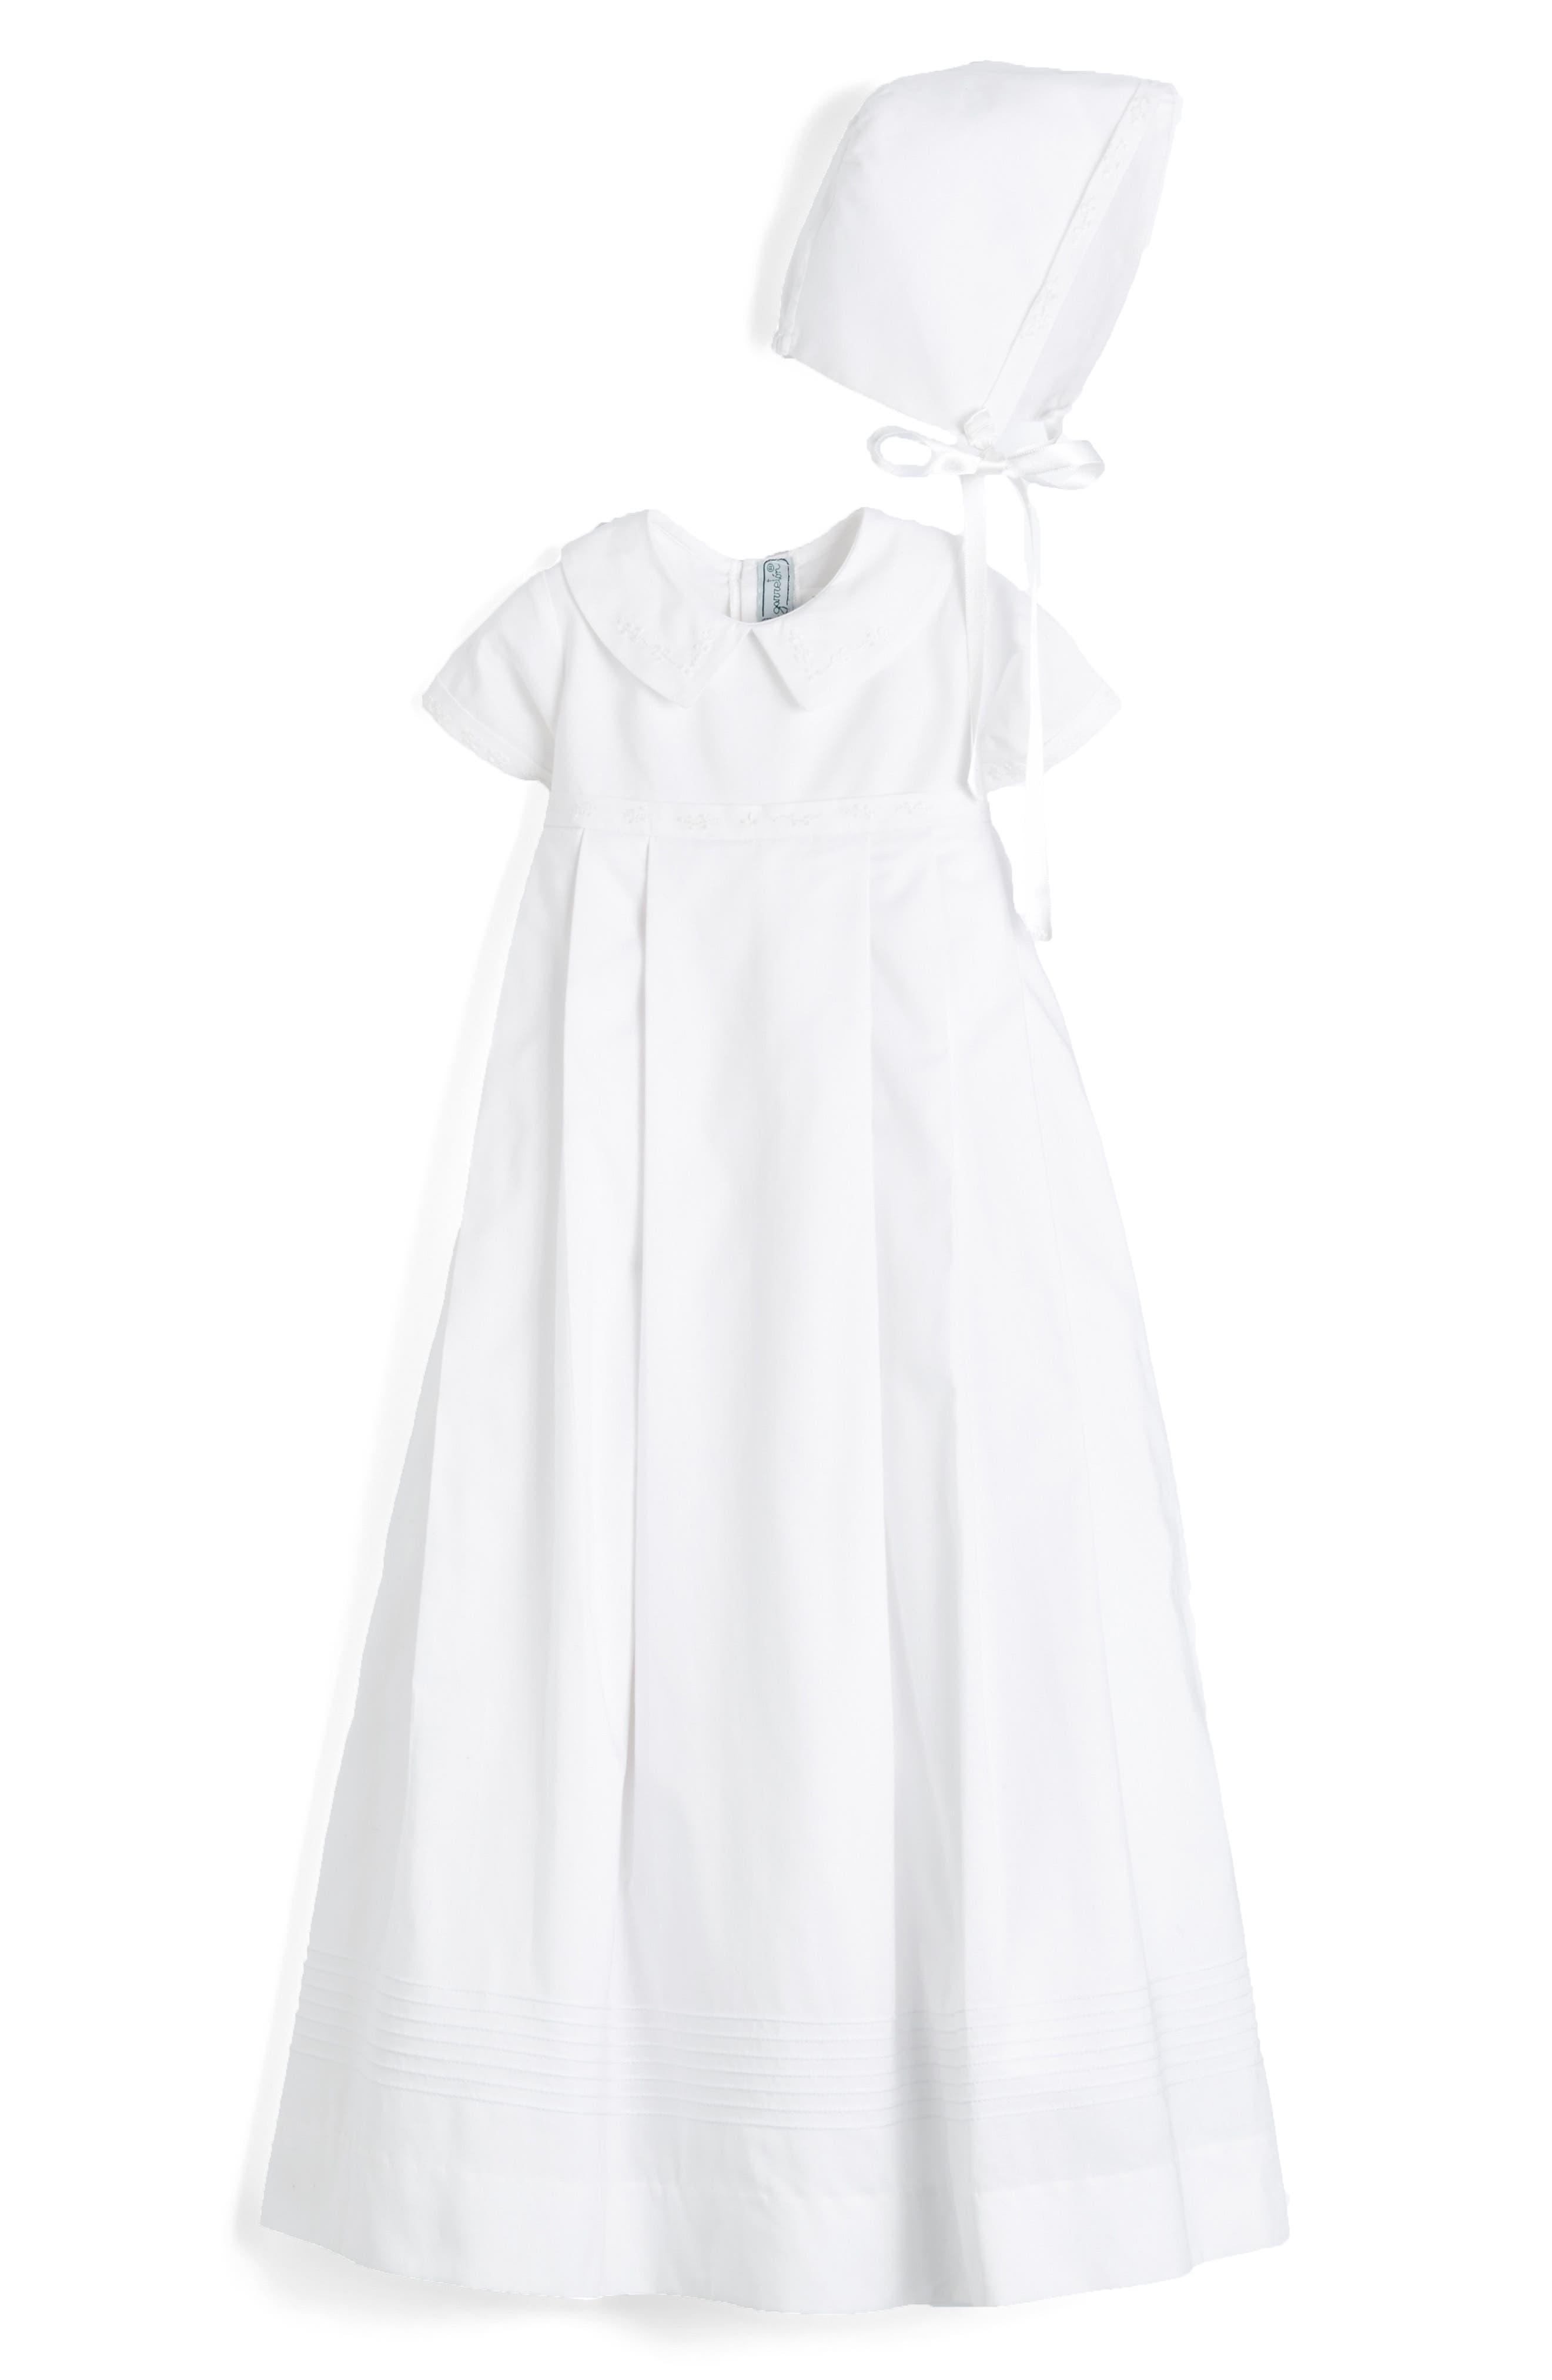 'Classic' Christening Gown & Bonnet,                             Alternate thumbnail 3, color,                             WHITE